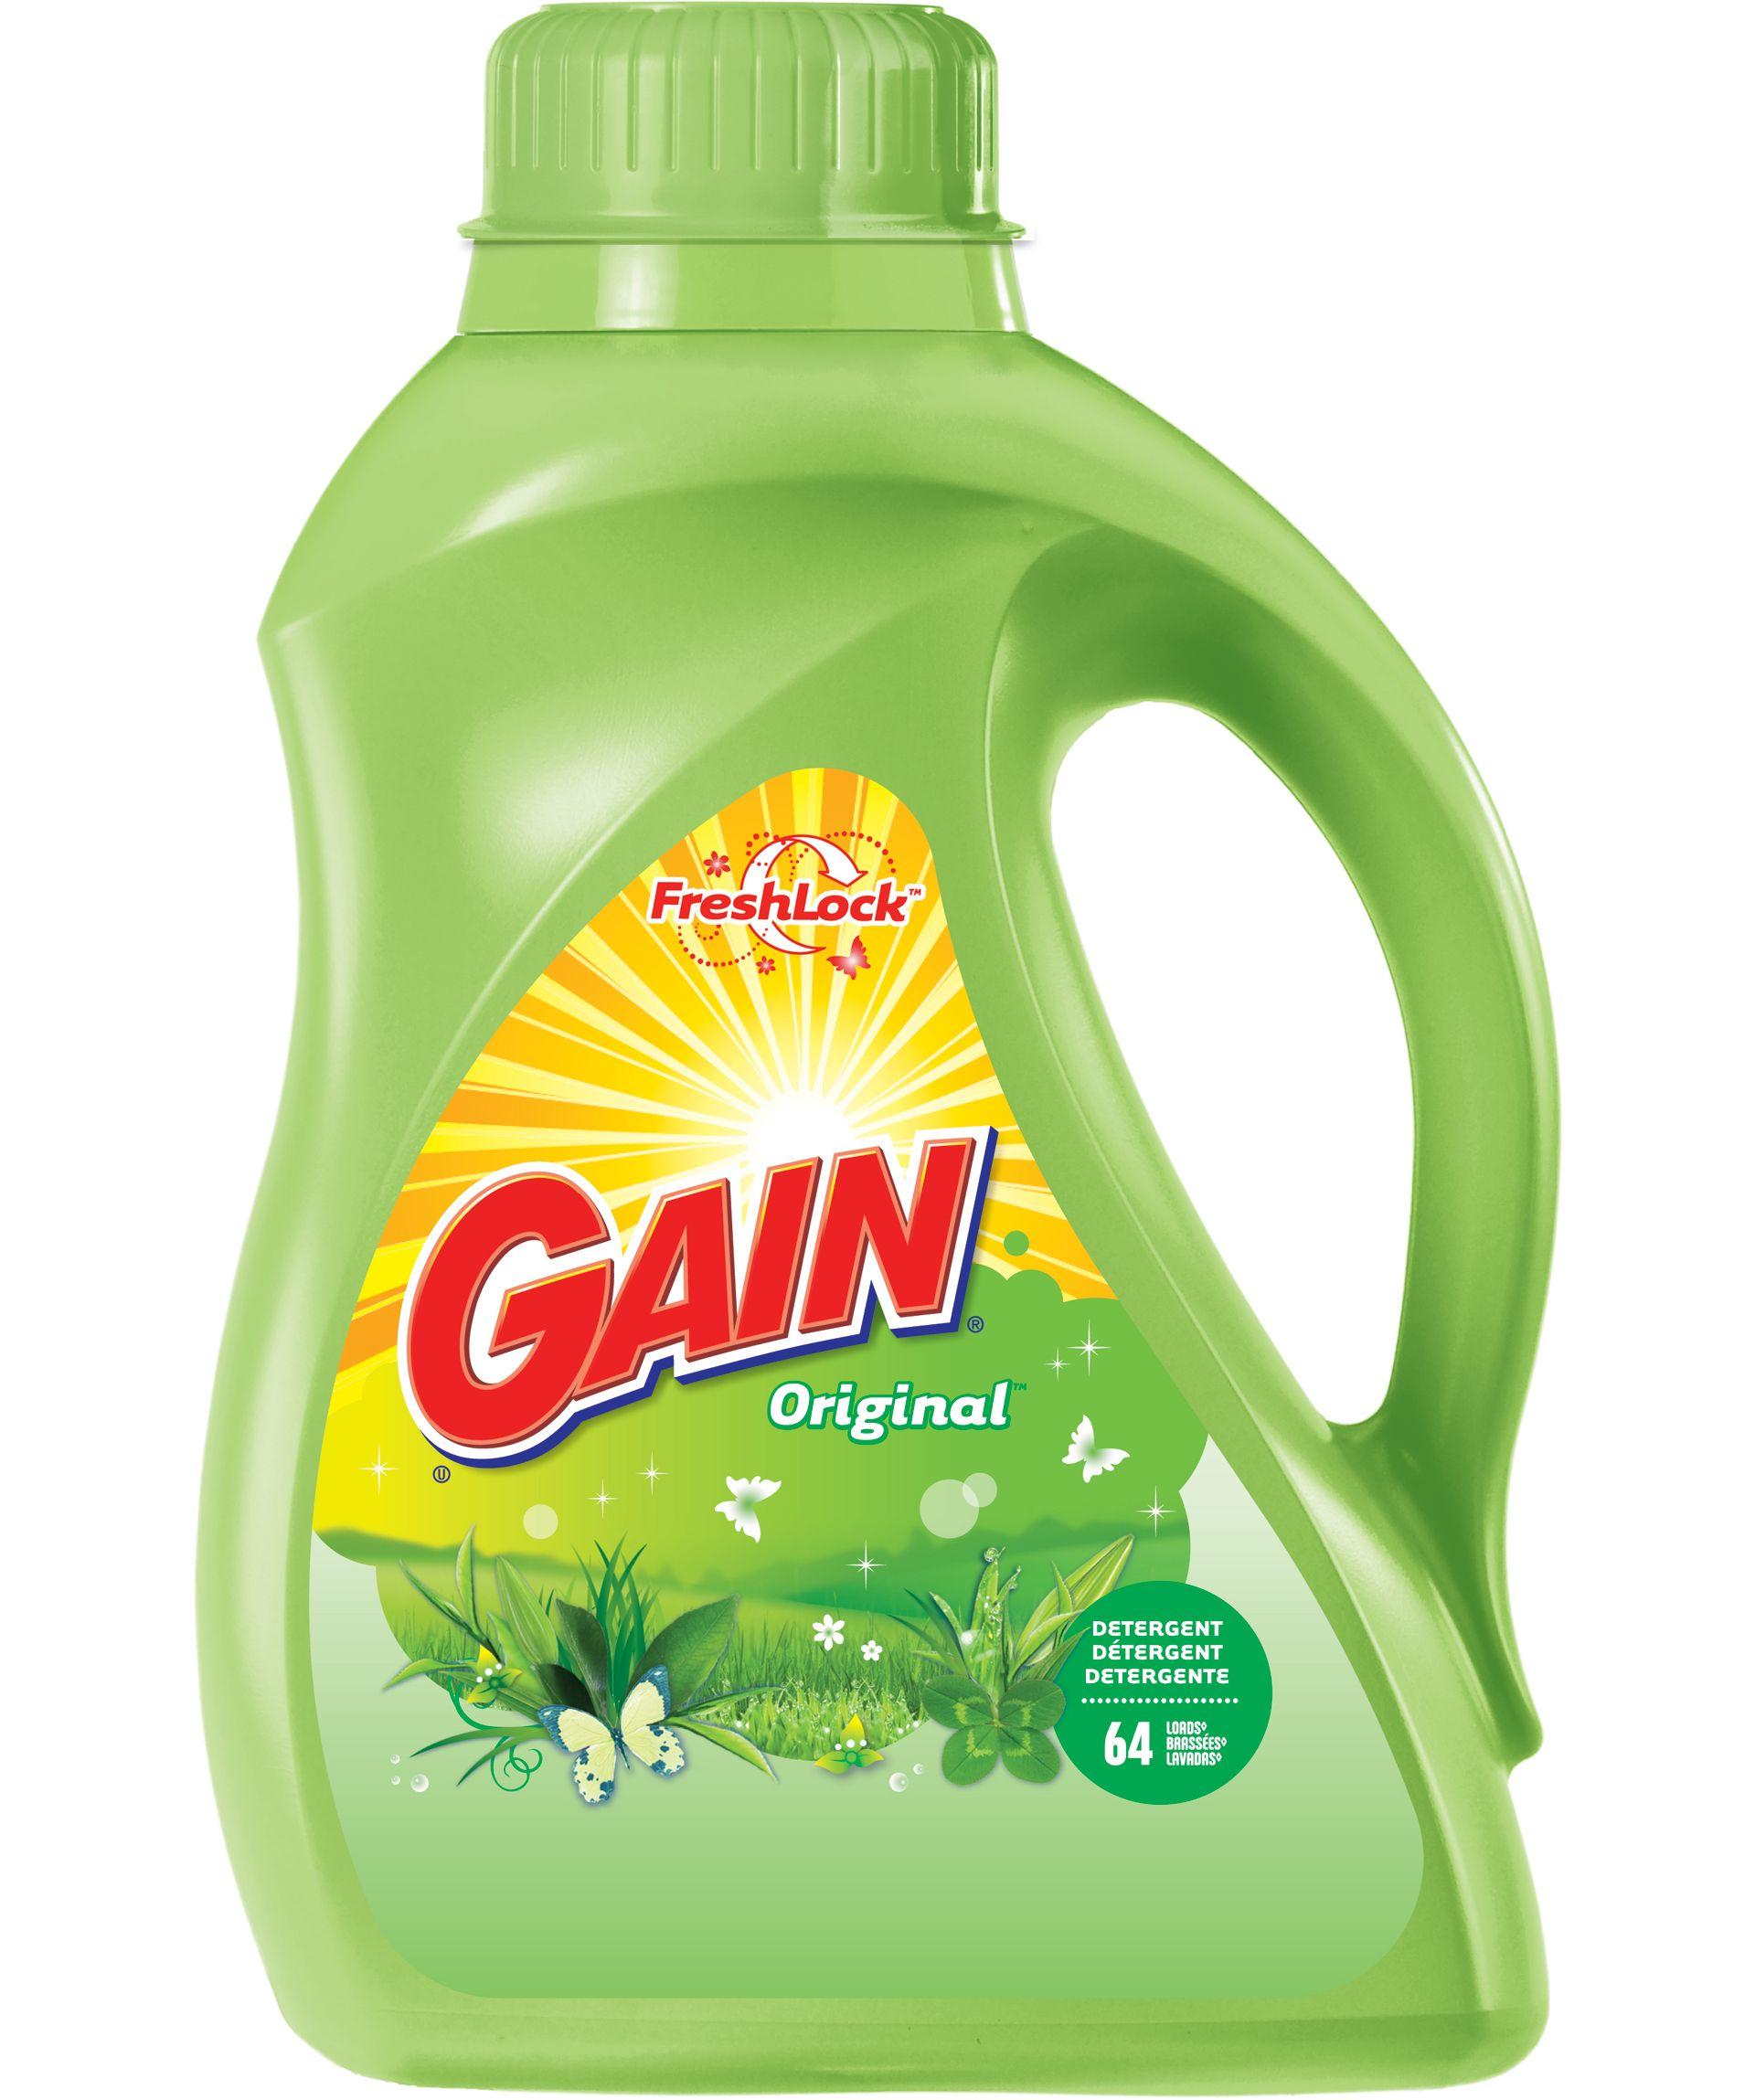 Hero Liquid Laundry Detergent Best Laundry Detergent Gain